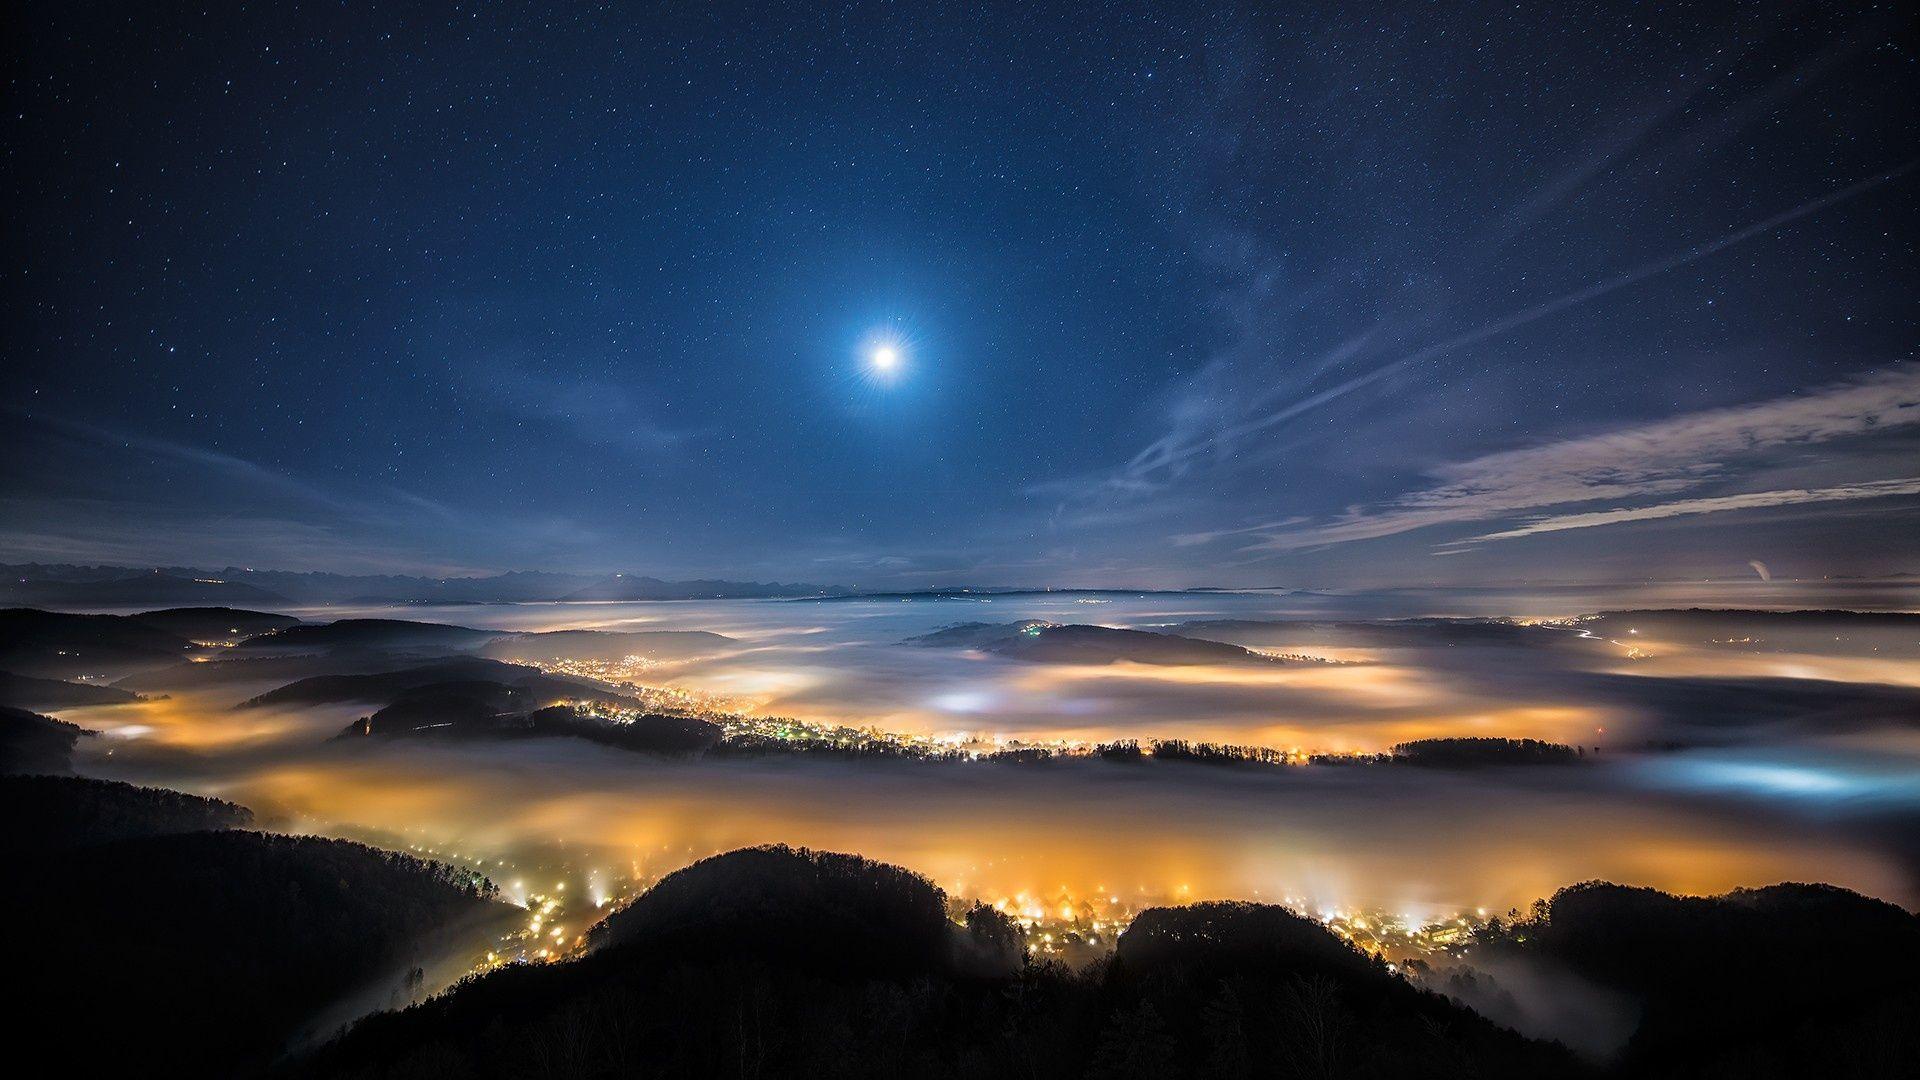 Night Sky Star Lights